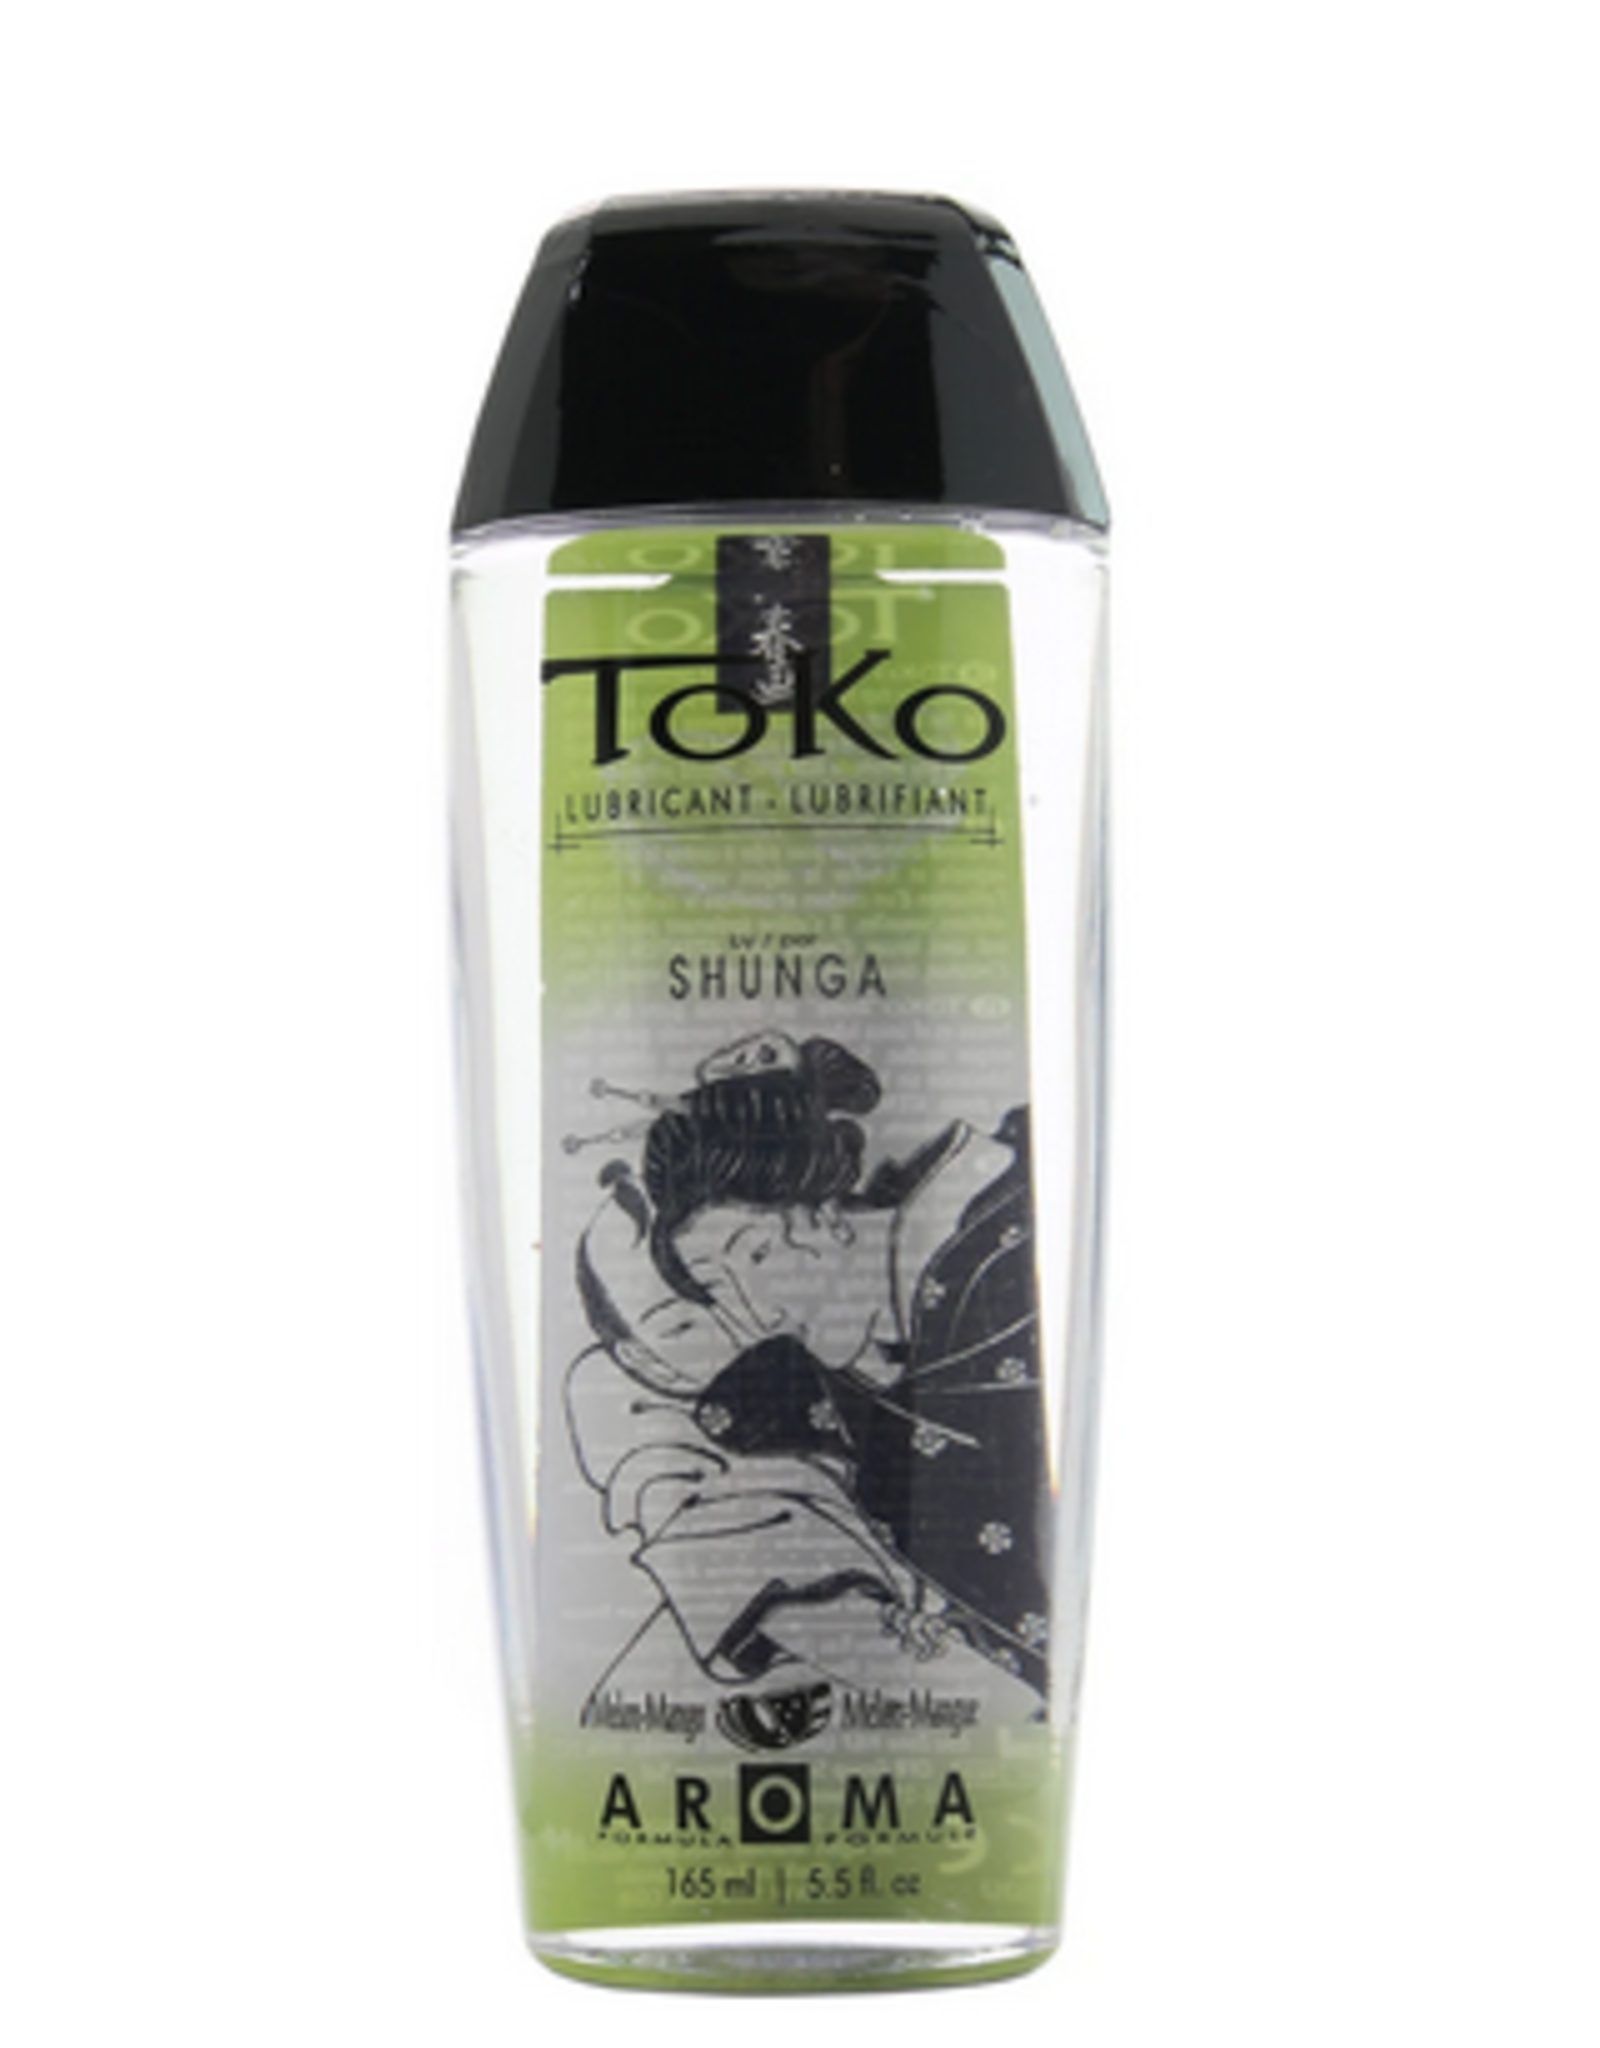 Shunga Toko Lubricant Melon-Mango 165ml / 5.5oz